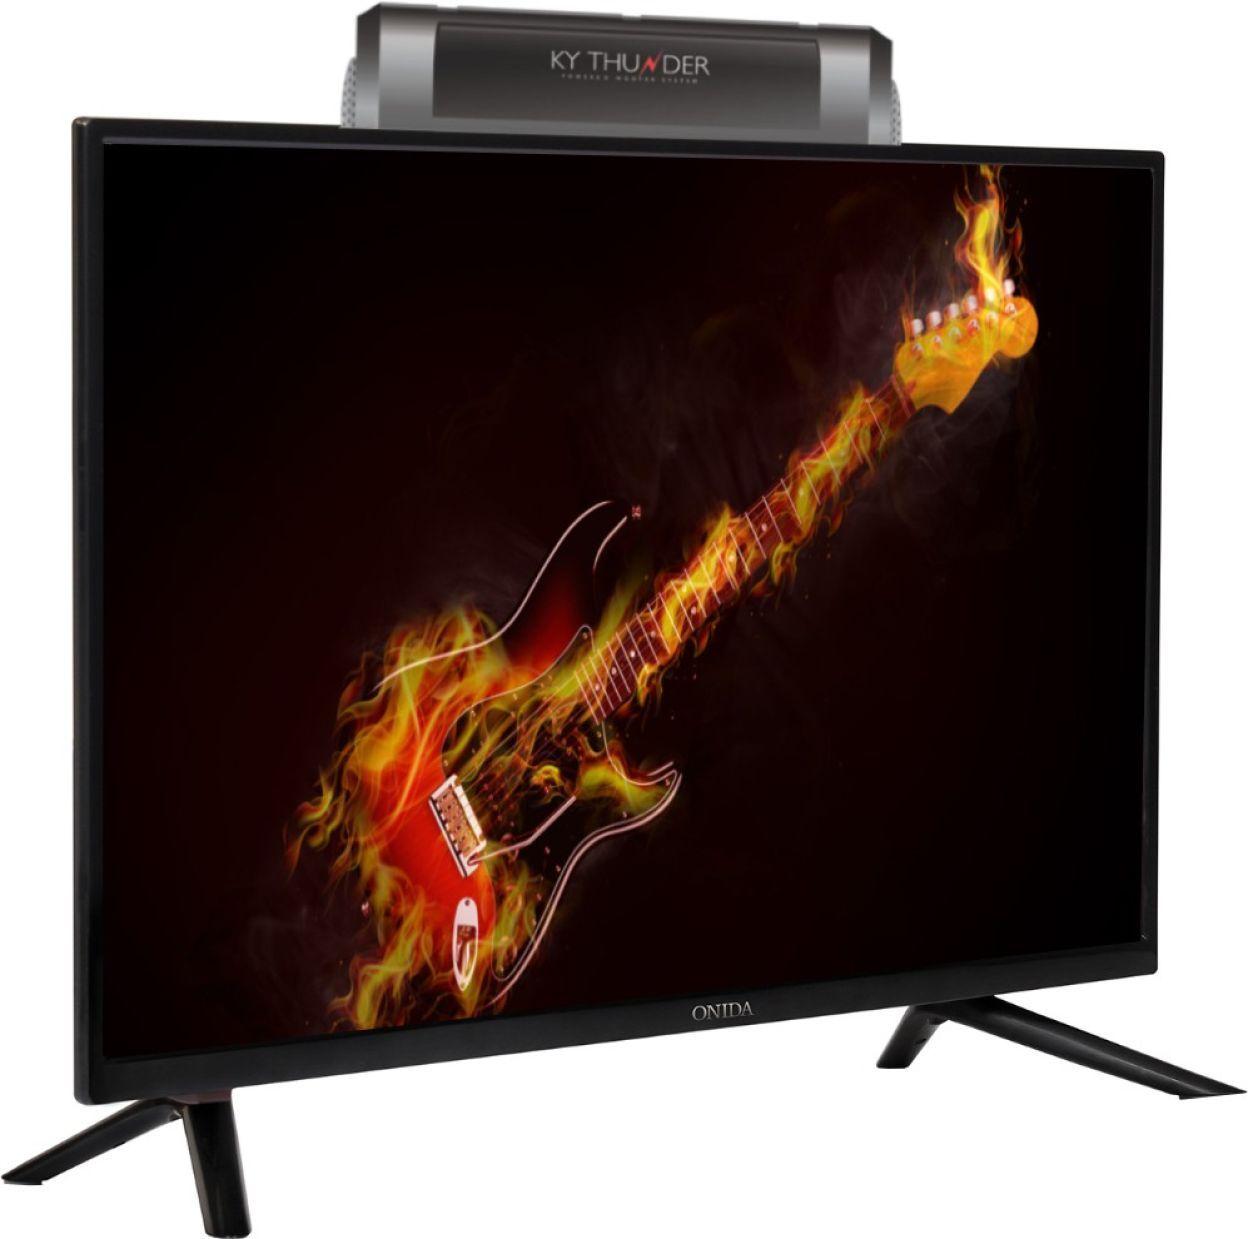 Onida Thunder Series 50FKY 48.5 Inch Full HD LED TV